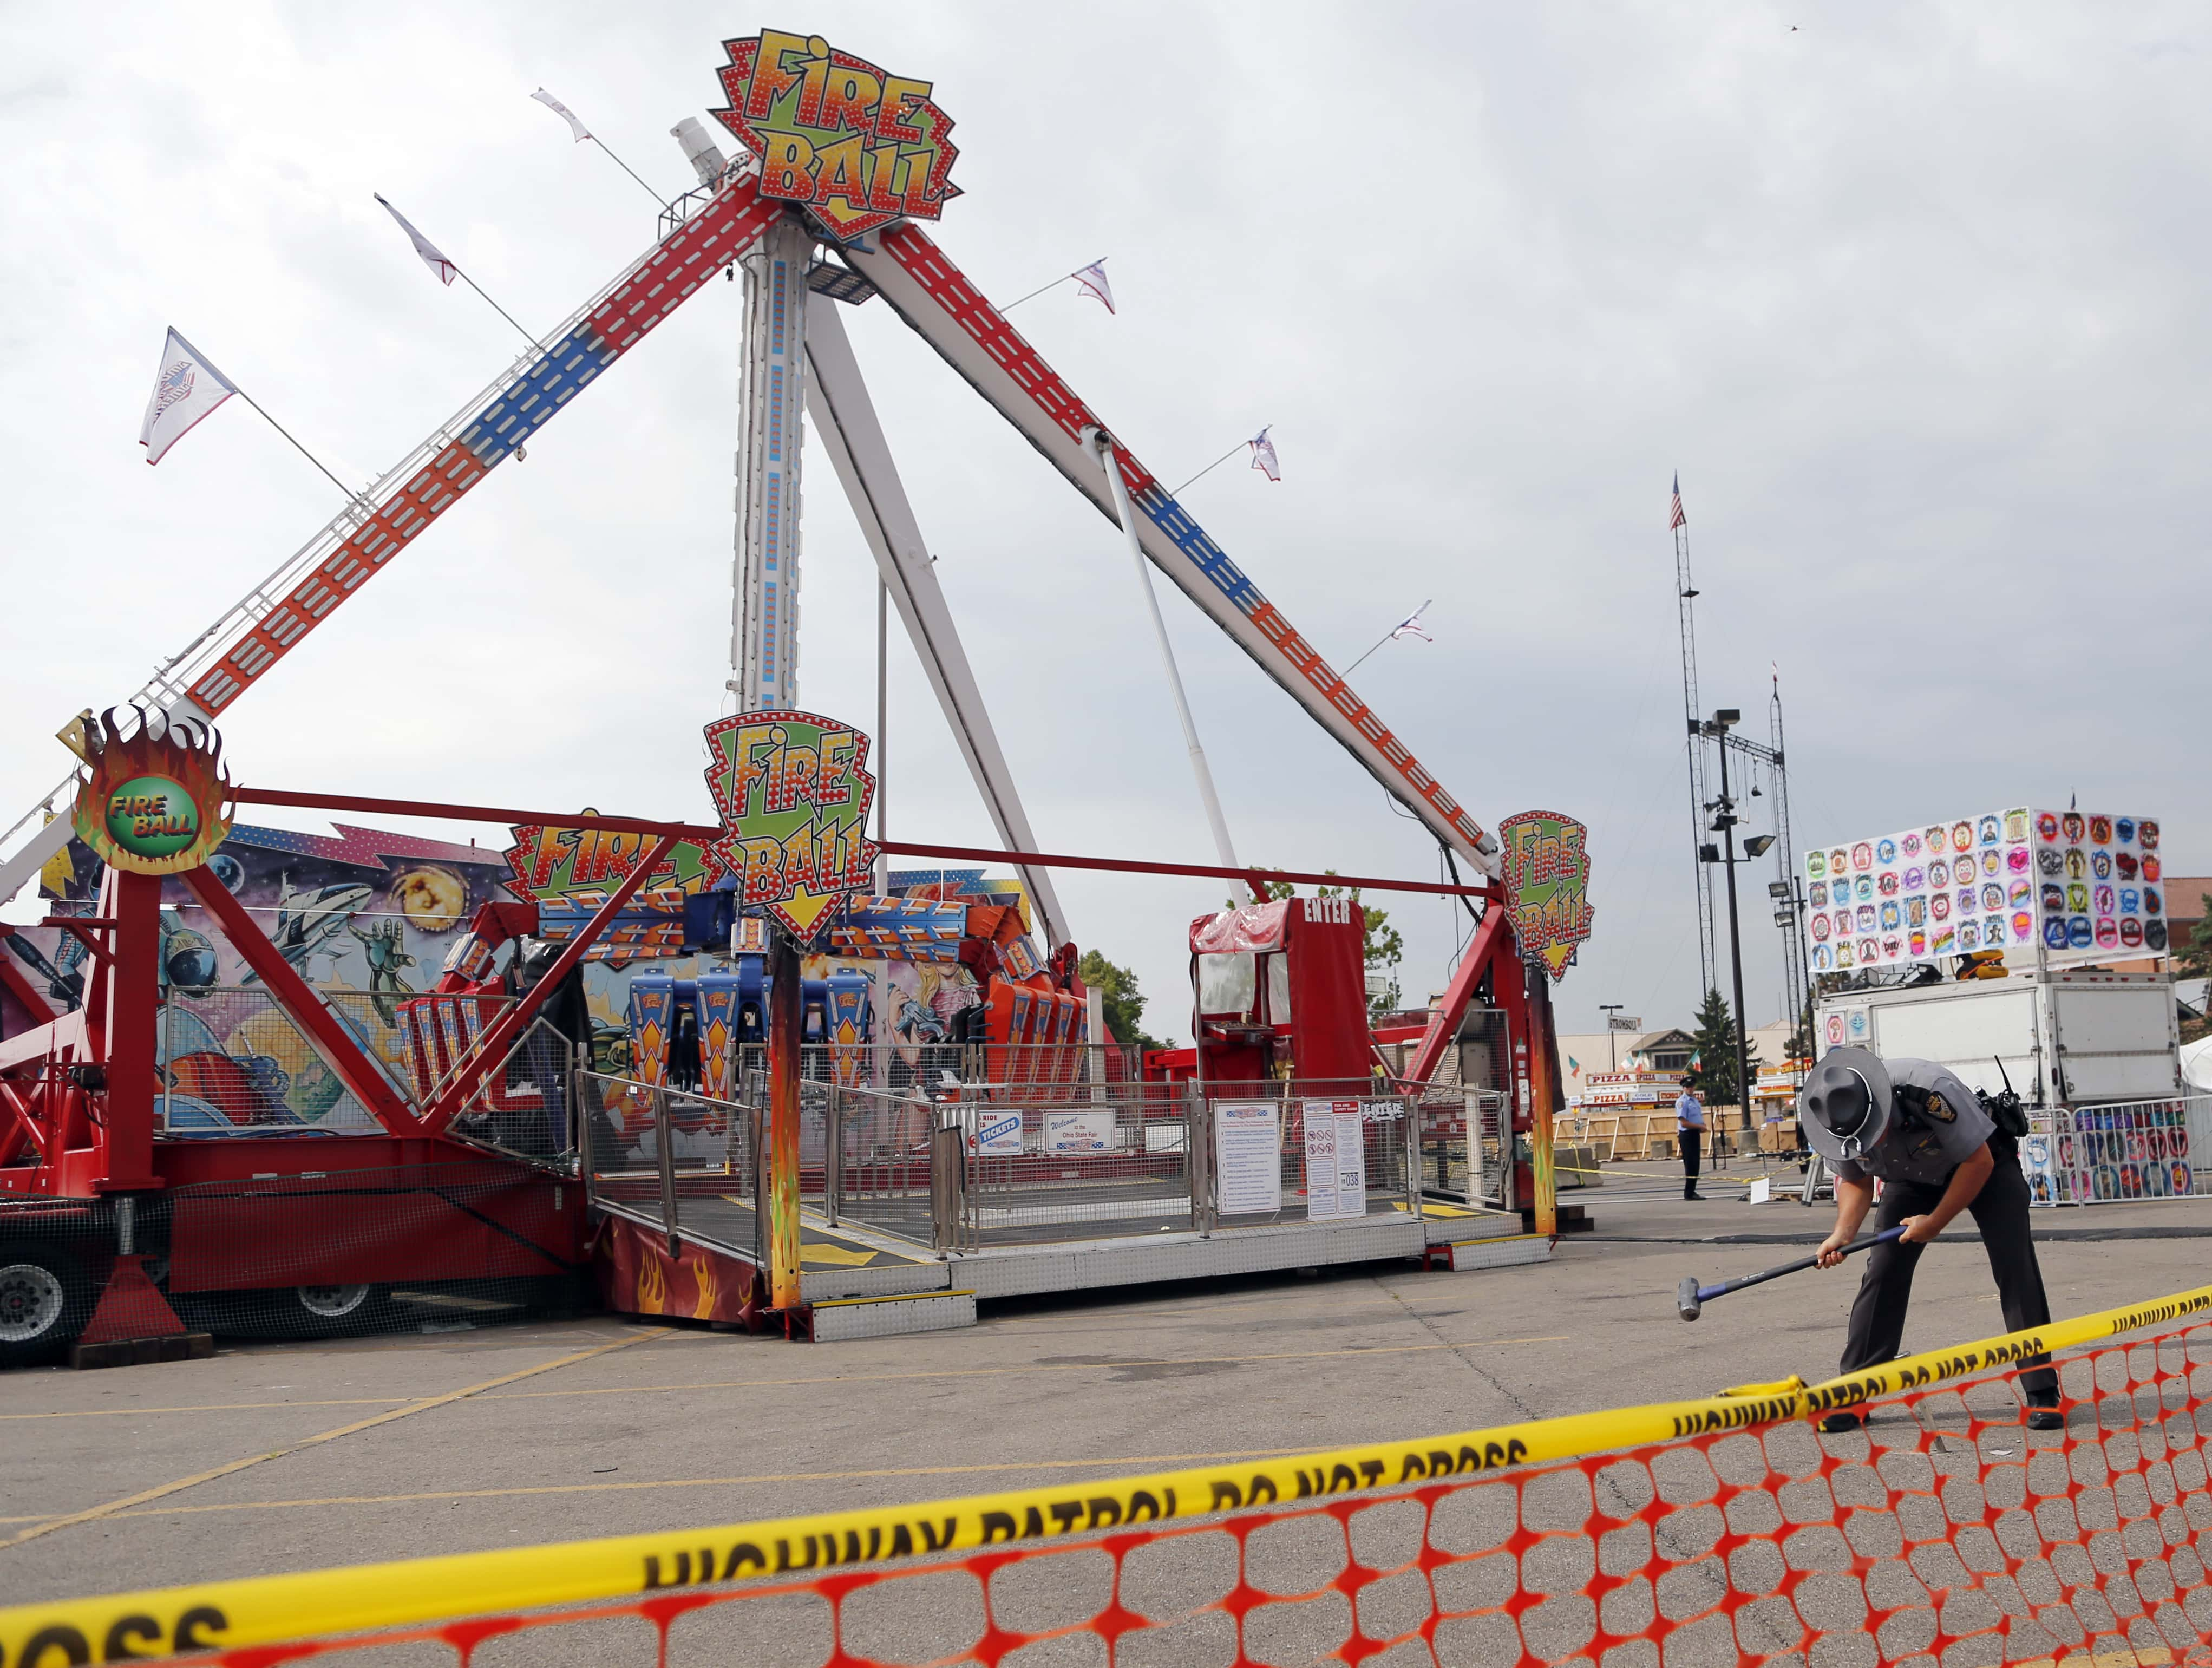 Sonoma Marin Fair 2020.Sonoma County Fair Wants To Reasure Public That Rides Are